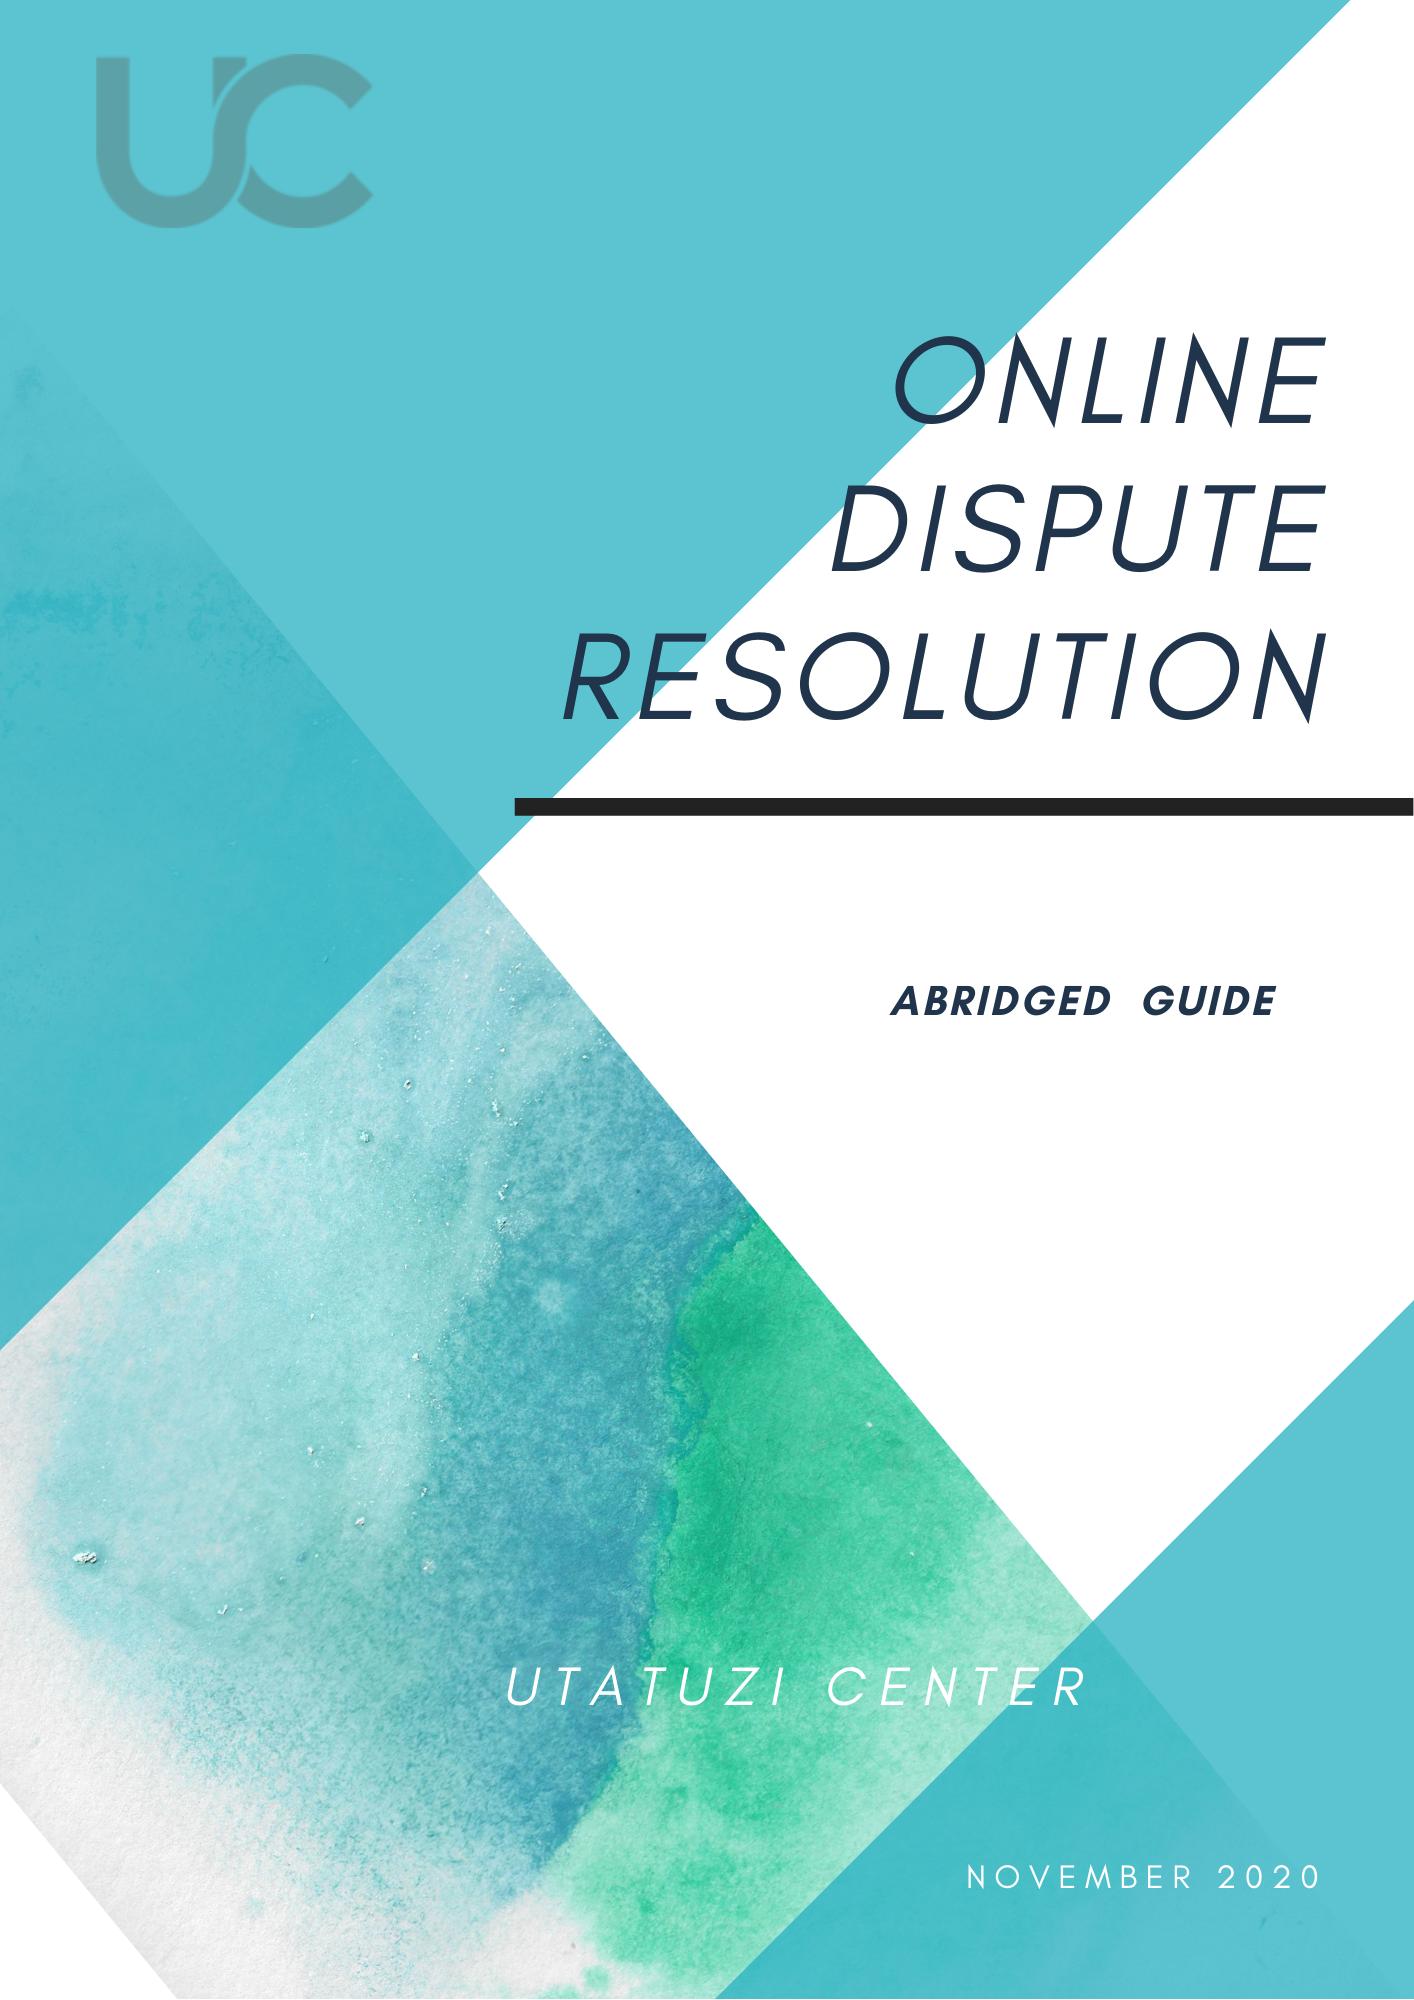 Online Dispute Resolution Guide